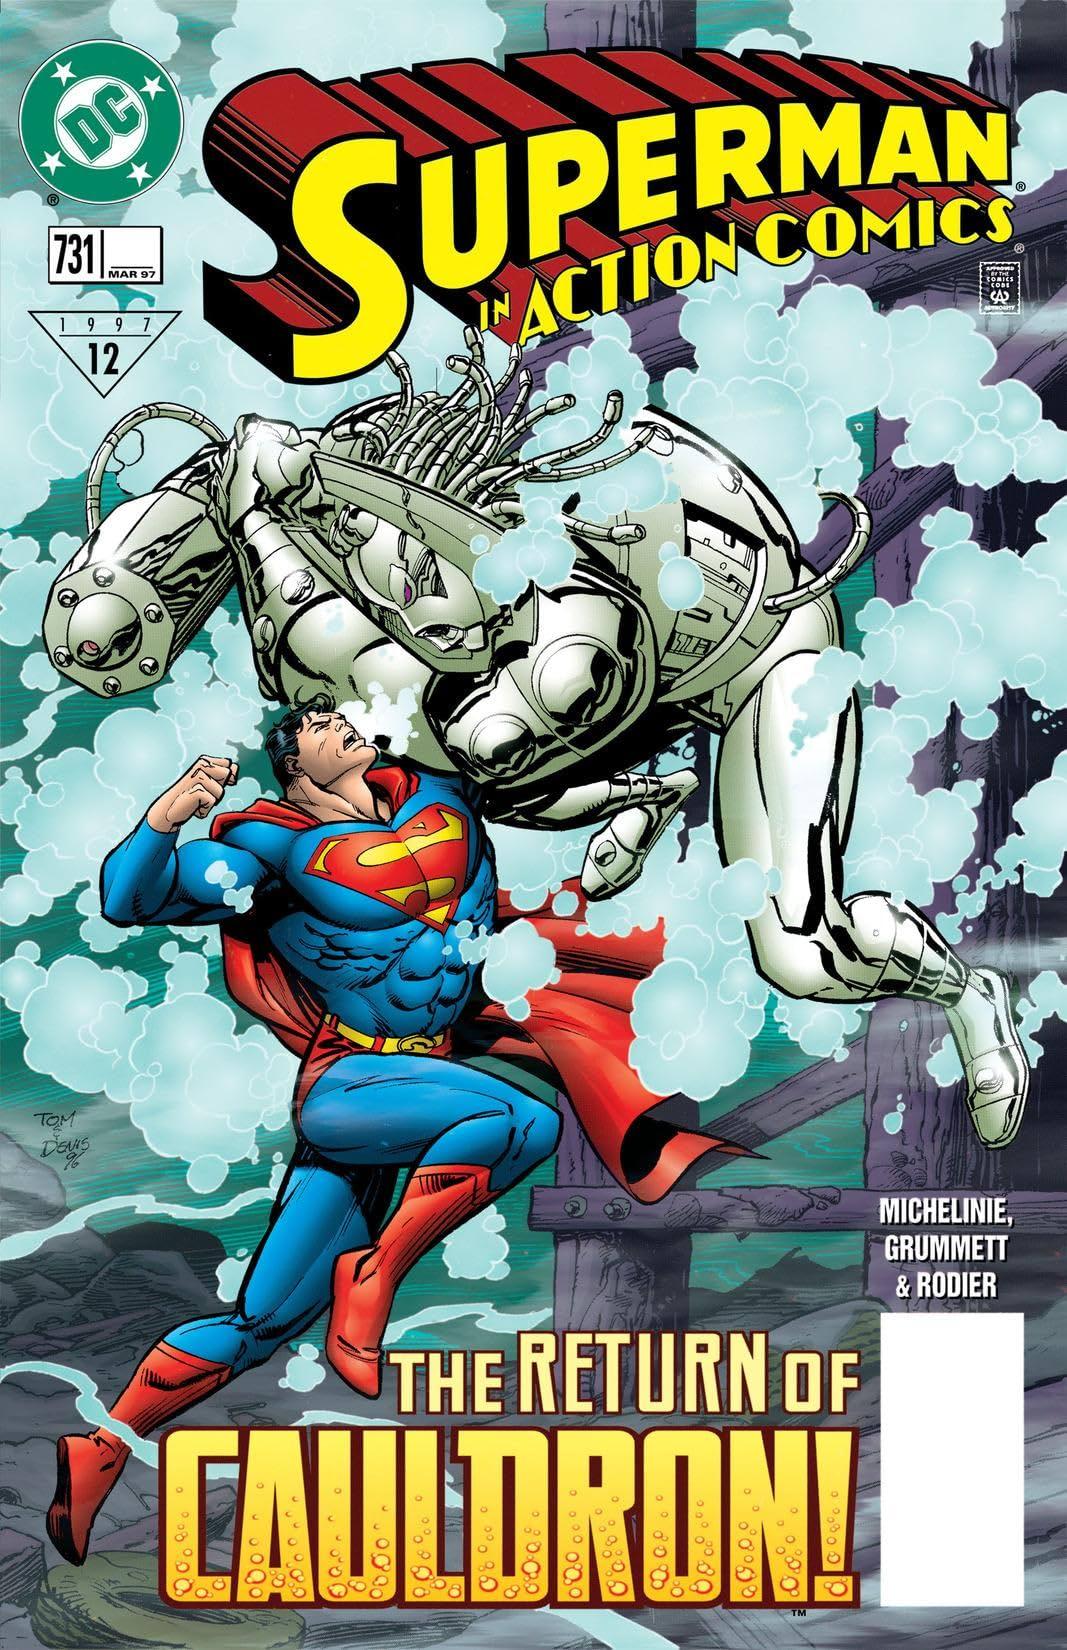 Action Comics (1938-2011) #731